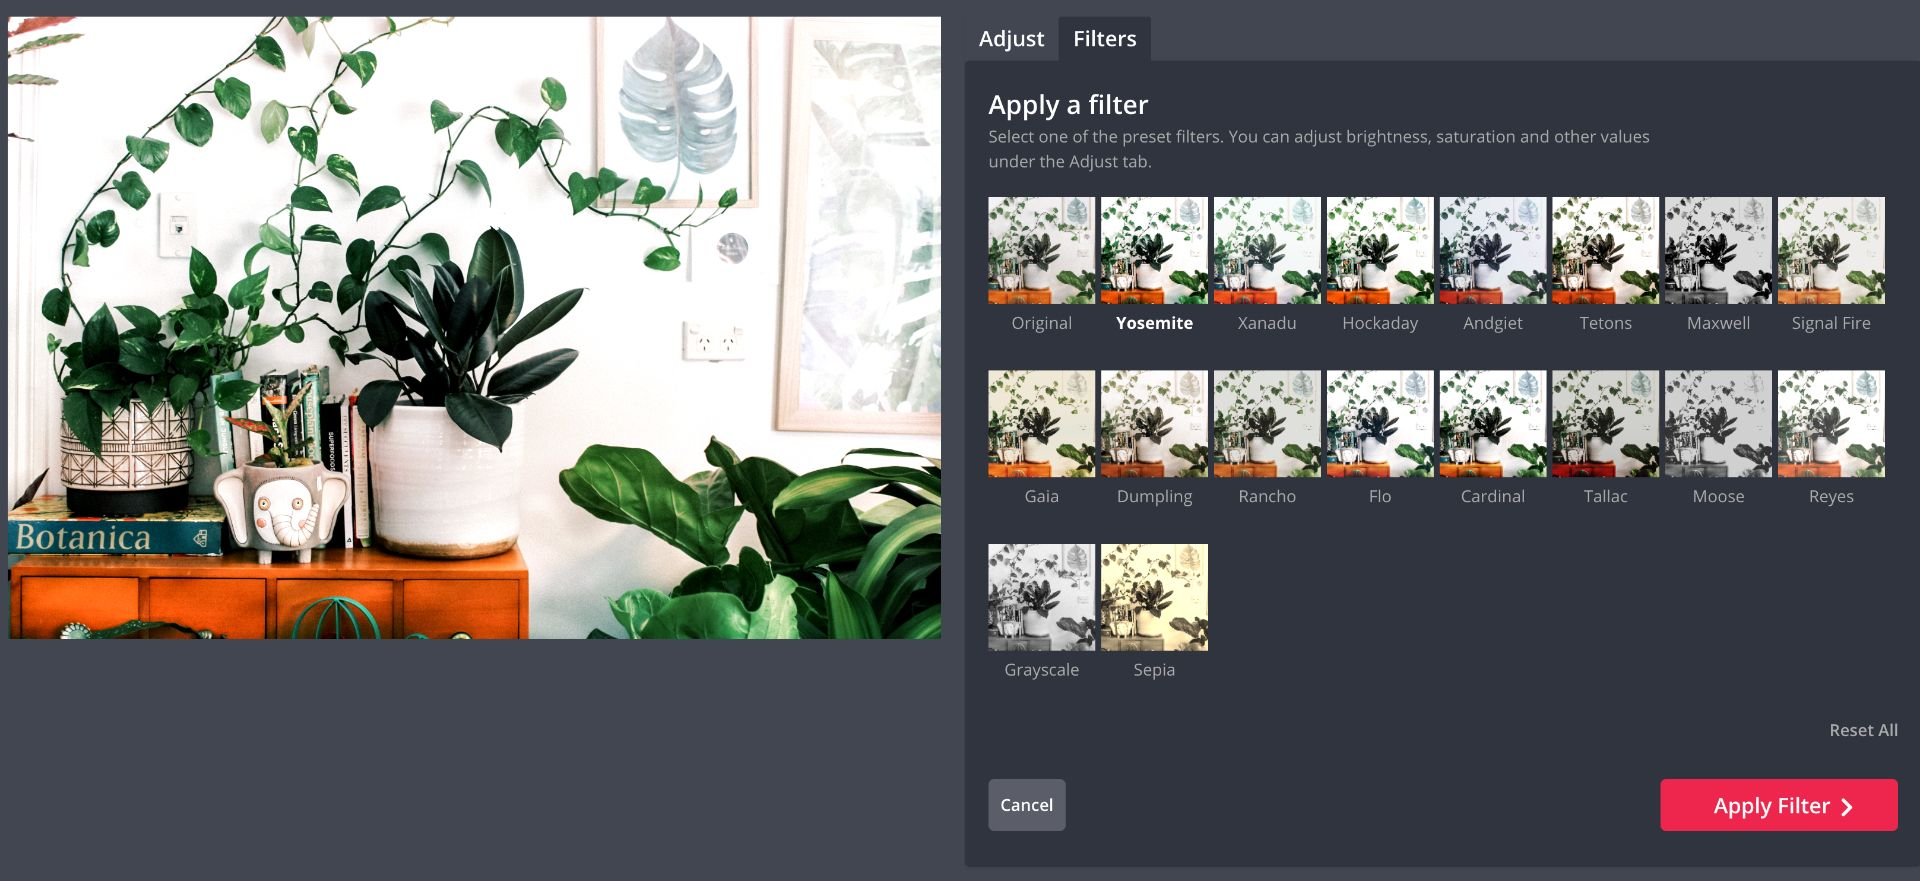 captura de pantalla de filtros en Kapwing